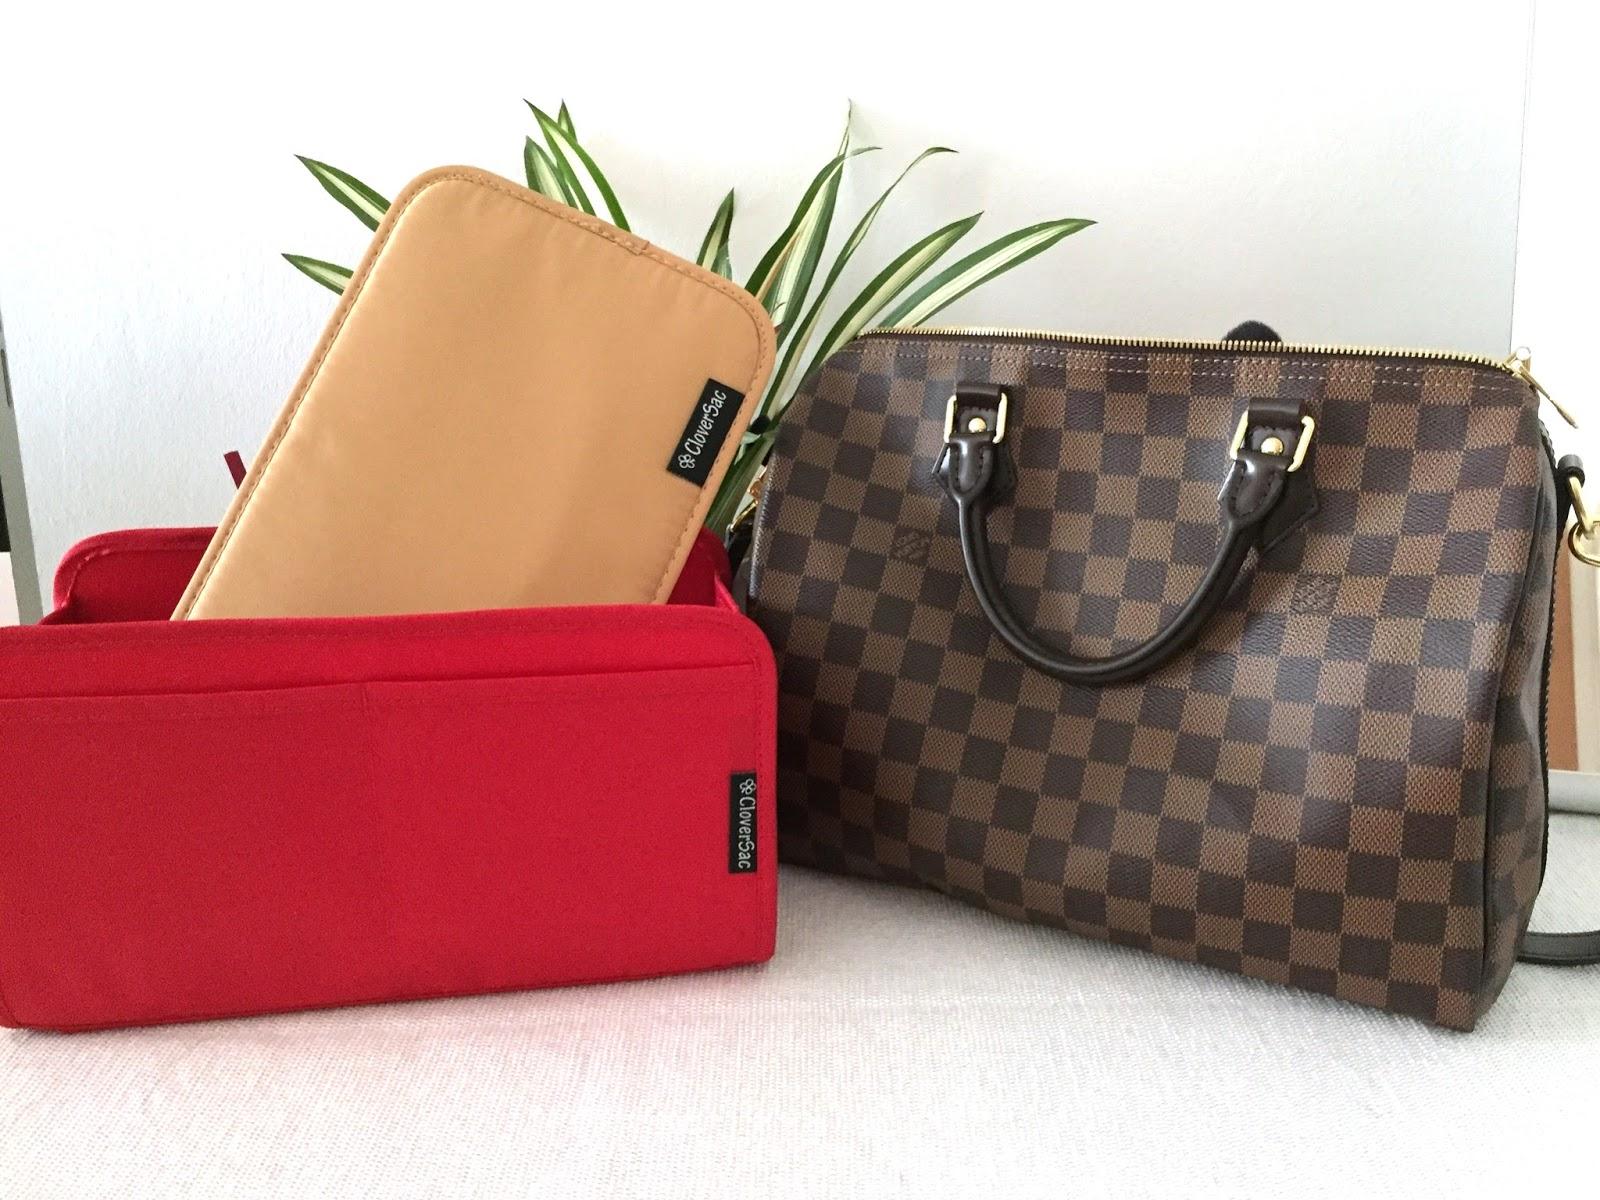 7fb4b45be702 CloverSac Handbag Organizer + Base Shaper    REVIEW - The Beauty ...